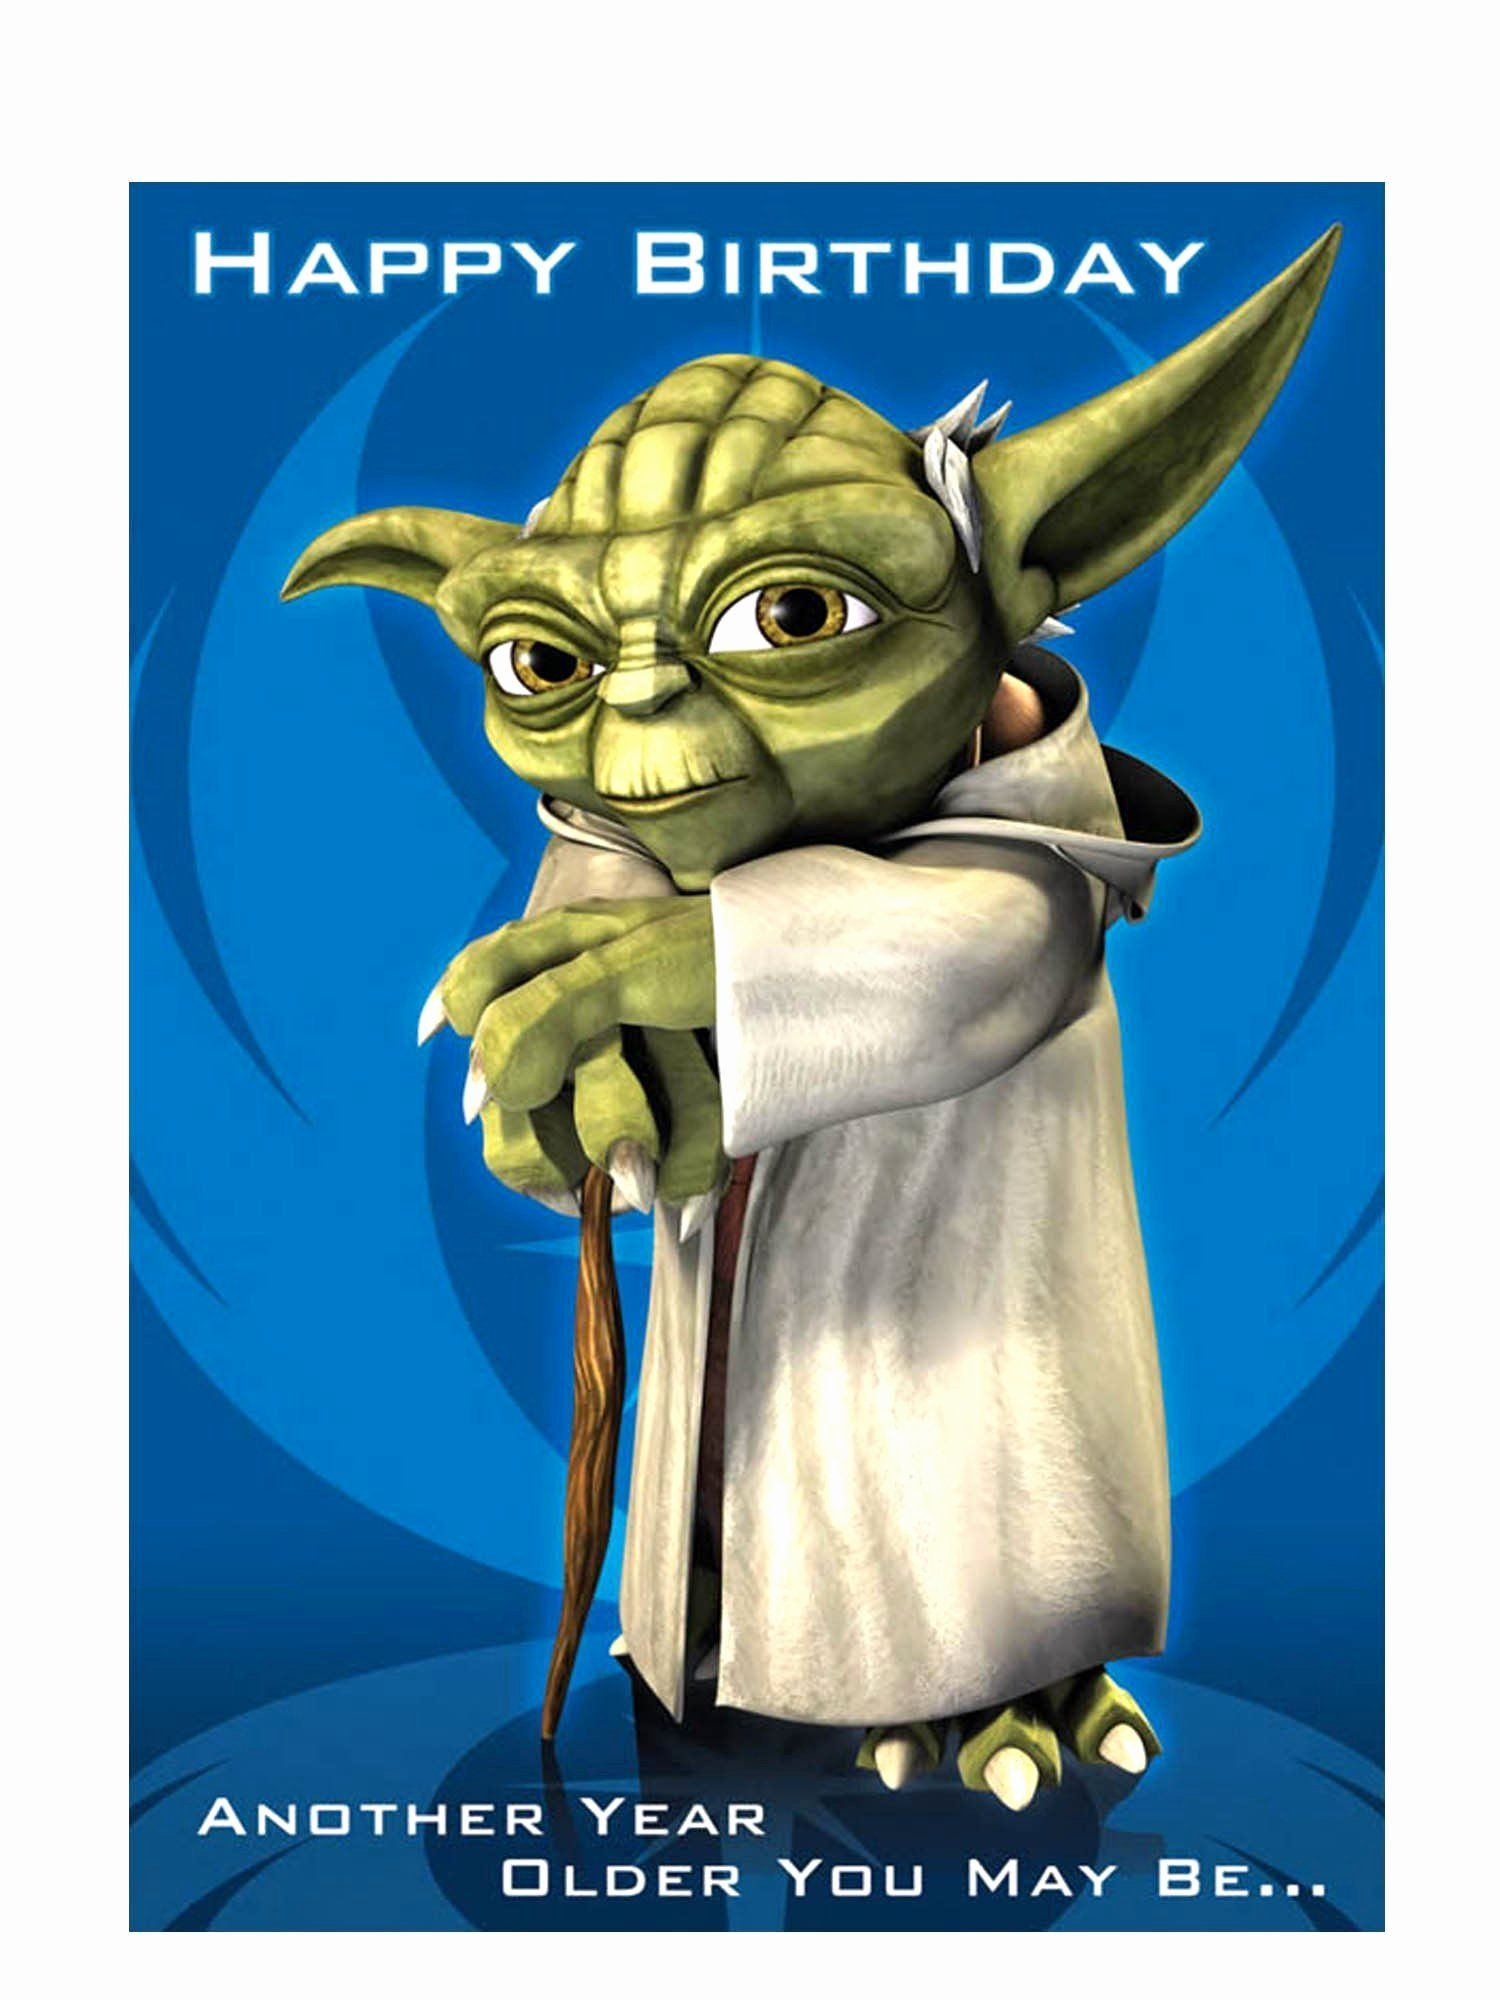 Star Wars Birthday E Cards Harlem Printable Invitations Star Wars Happy Birthday Star Wars Birthday Birthday Meme